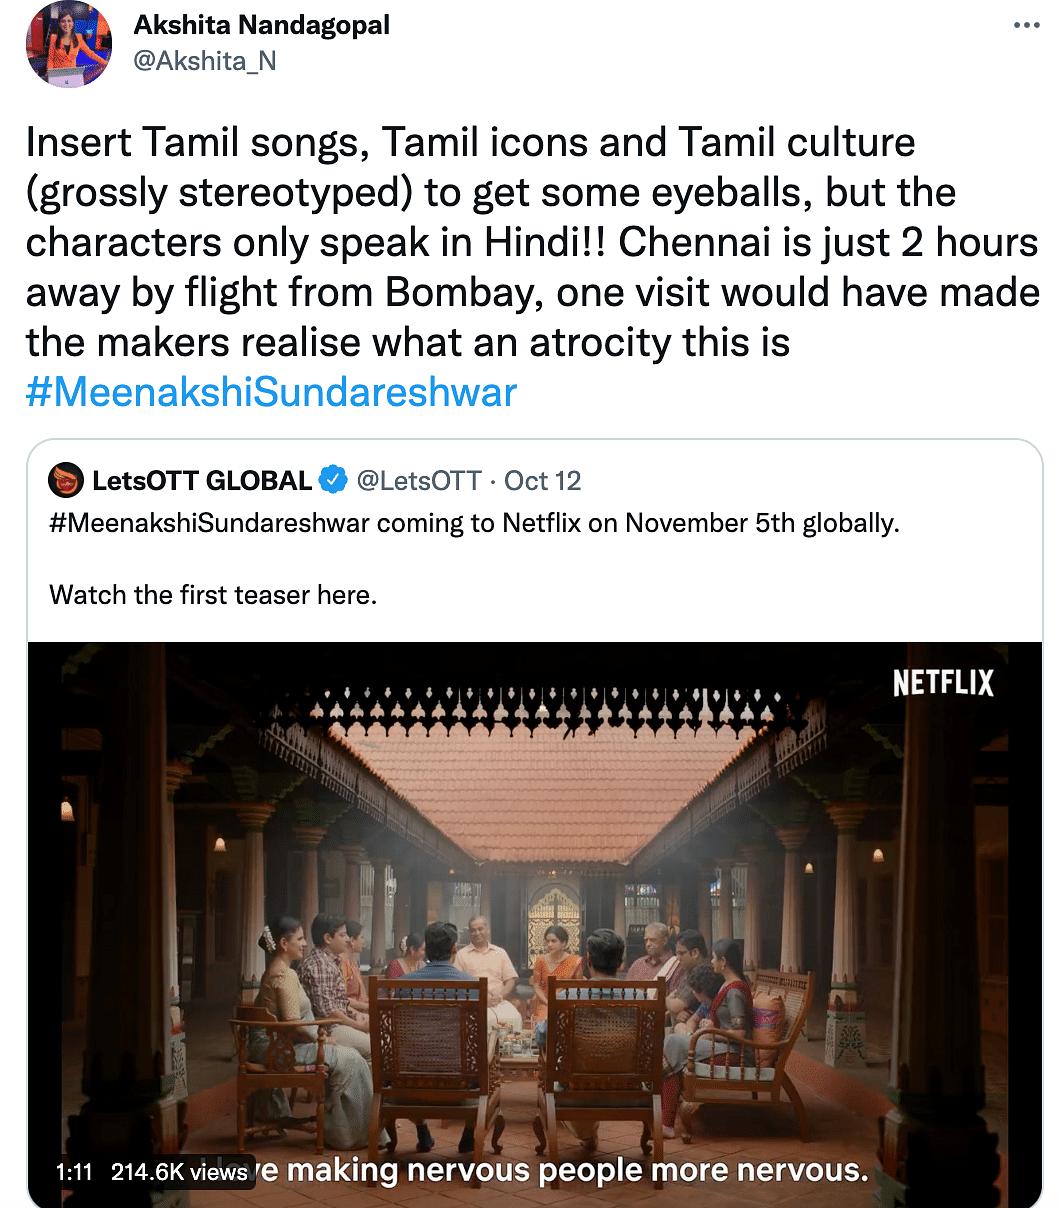 Karan Johar's 'Meenakshi Sundareshwar' Called Out for Stereotyping Tamilians